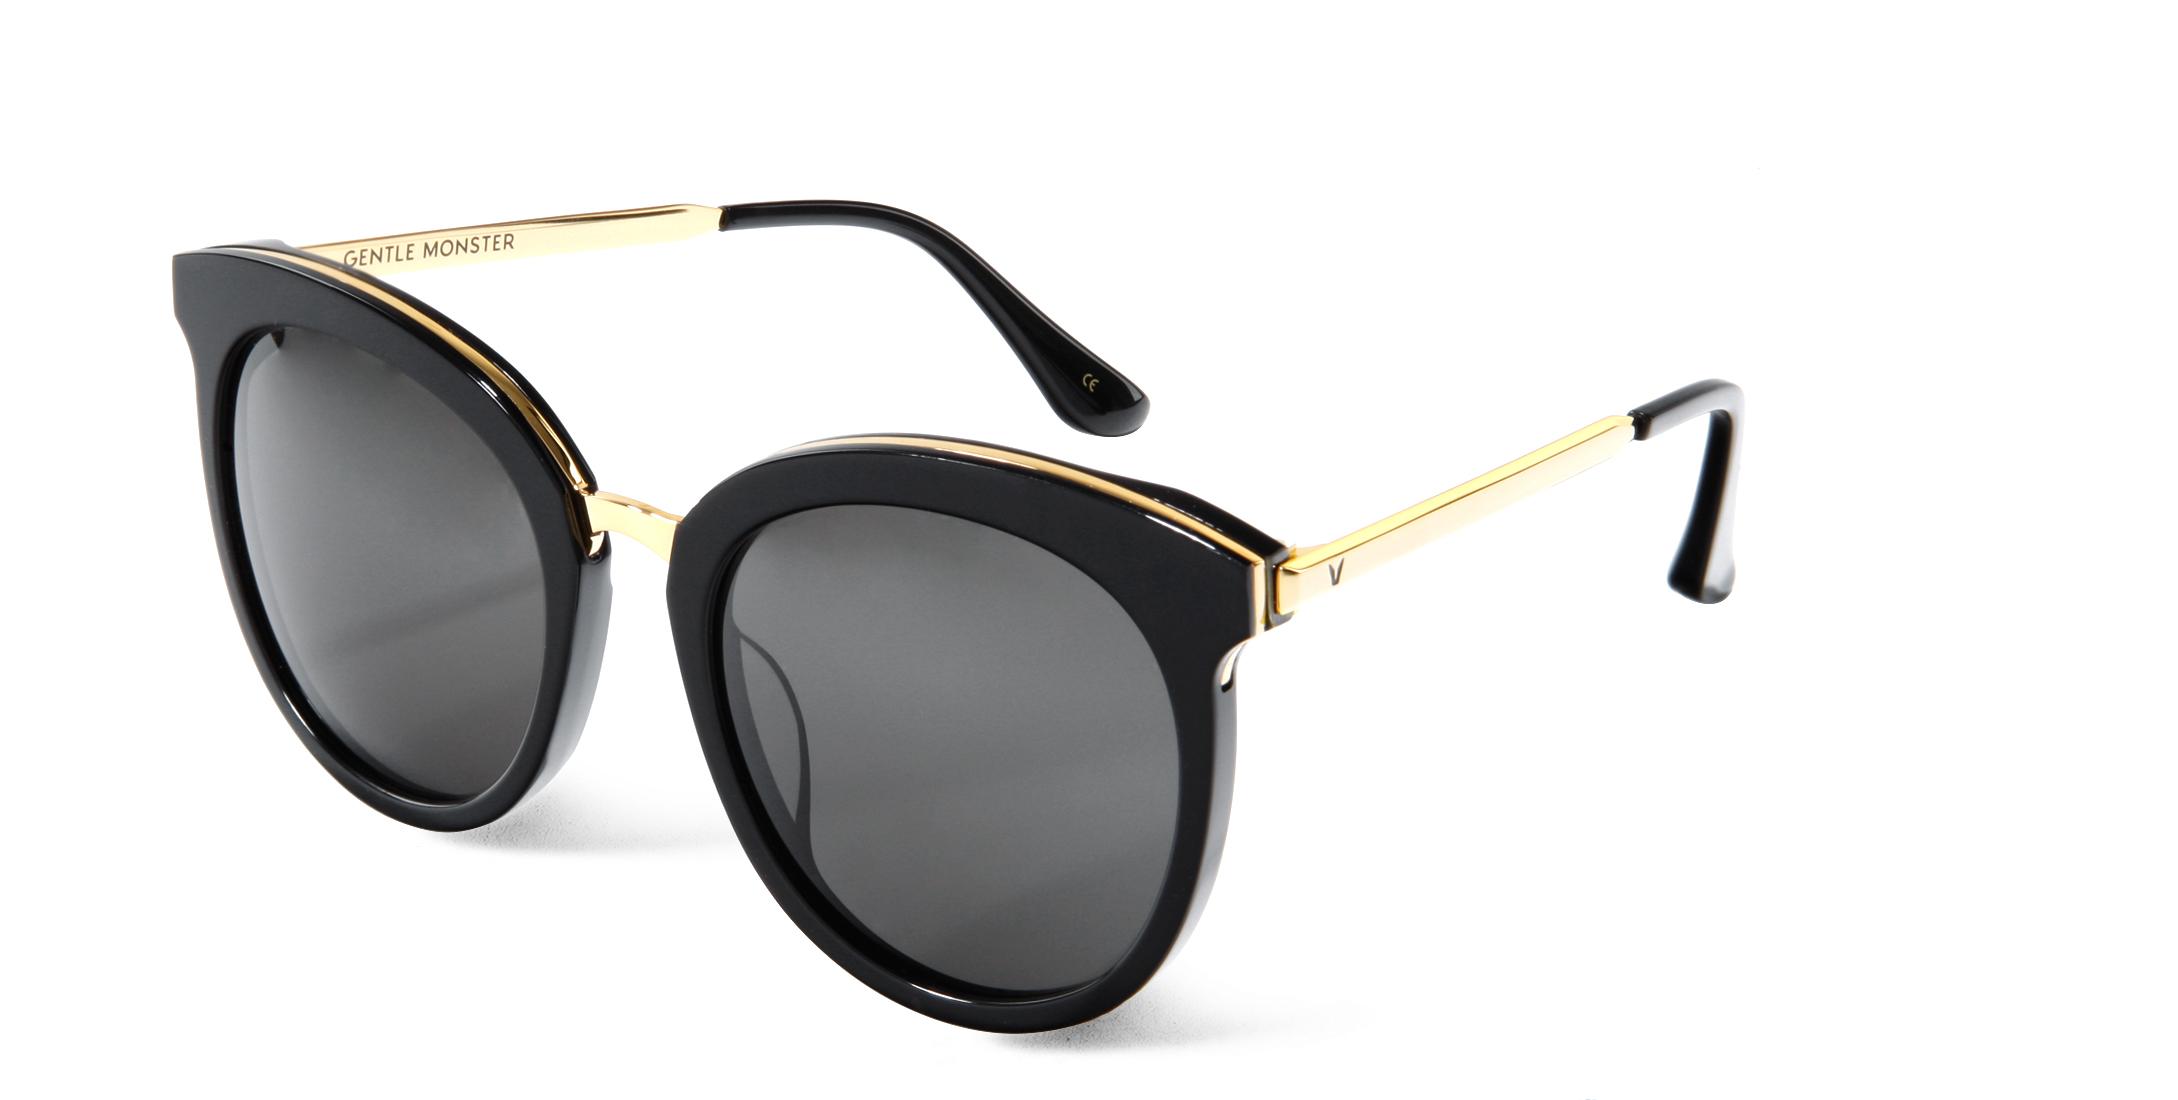 8aaff6d32350 GENTLE MONSTER LOVESOME ONE 01 GOLD 韓國超強勢太陽眼鏡品牌~ ~全球時尚部落客愛用推薦!!!